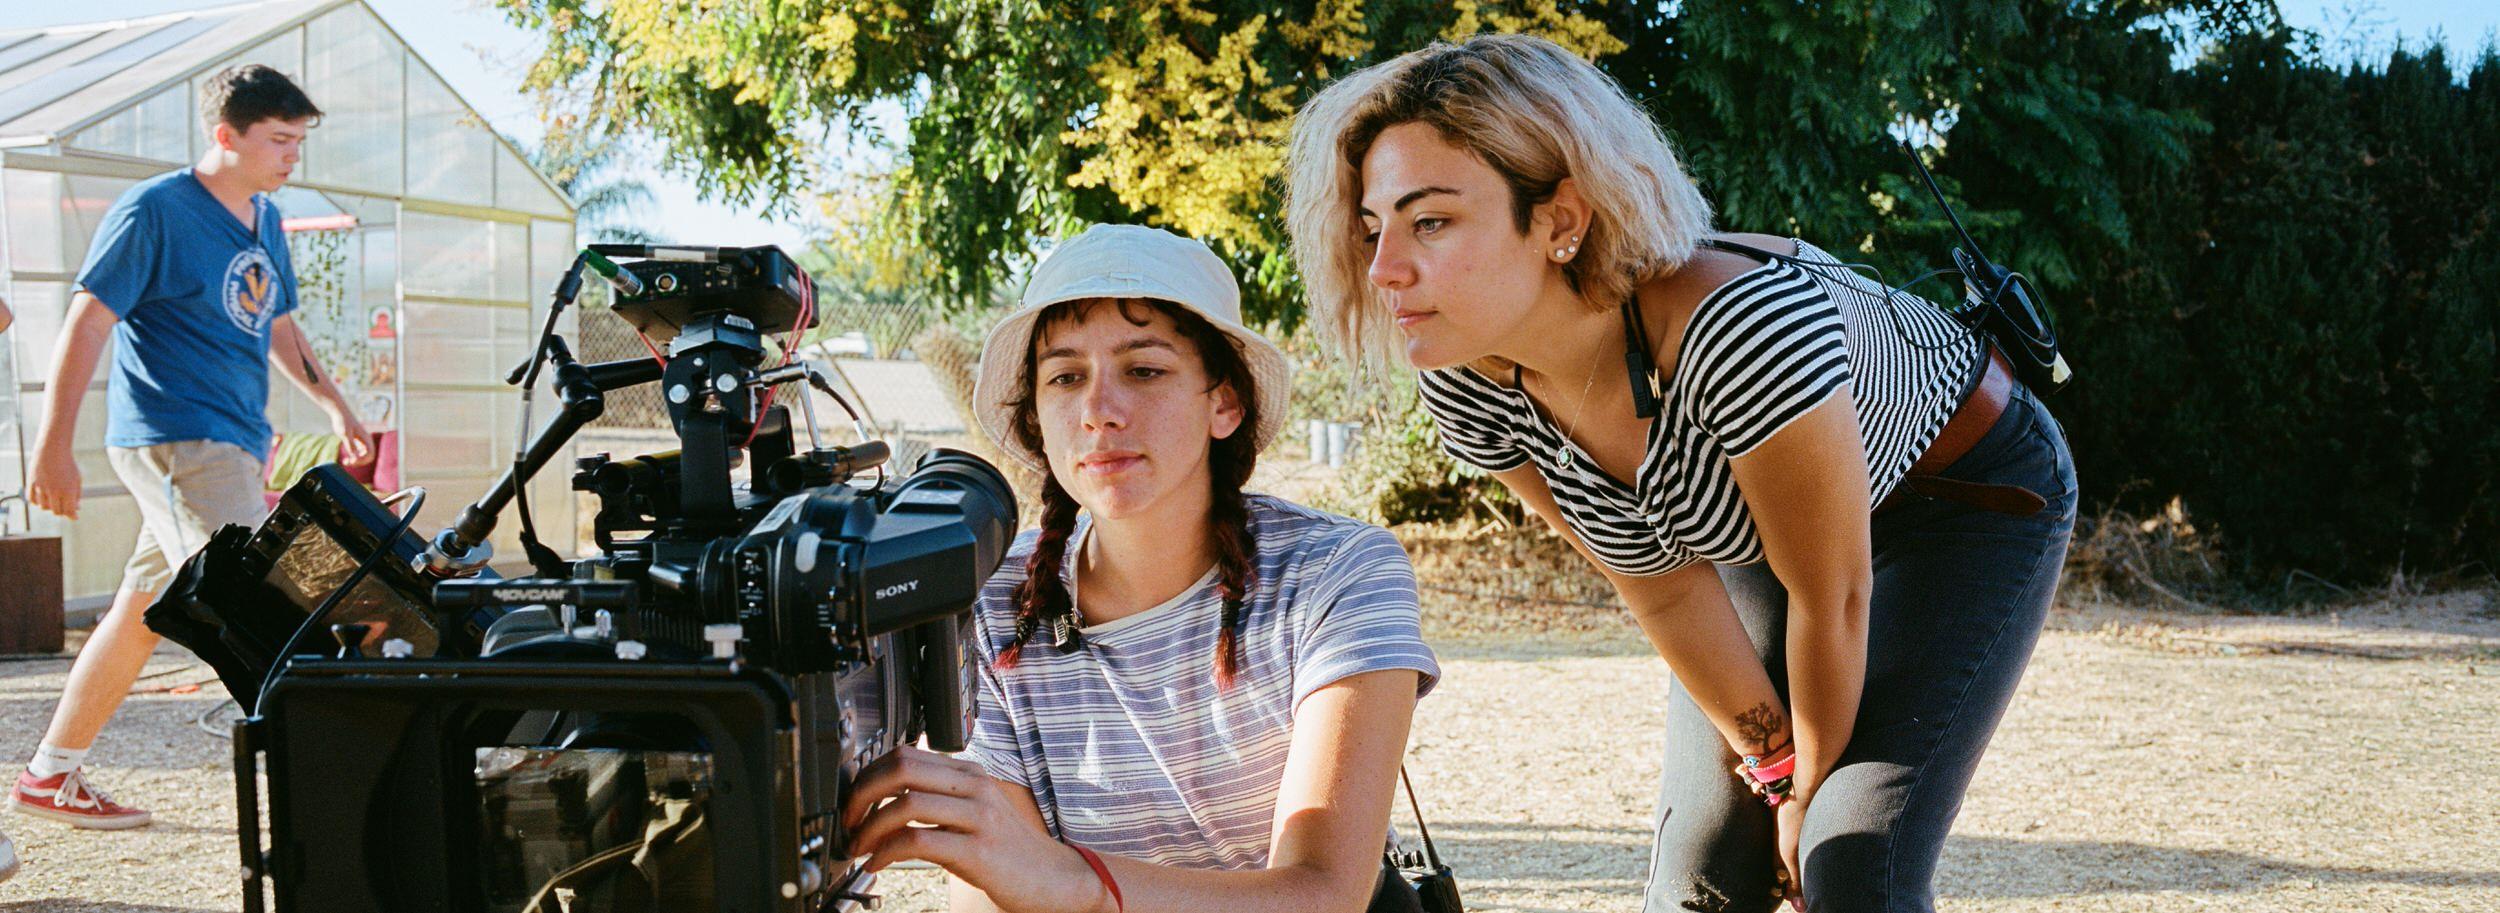 film-objektiv-Kodak-400-panoramic-xpan-2500x913-2.jpg